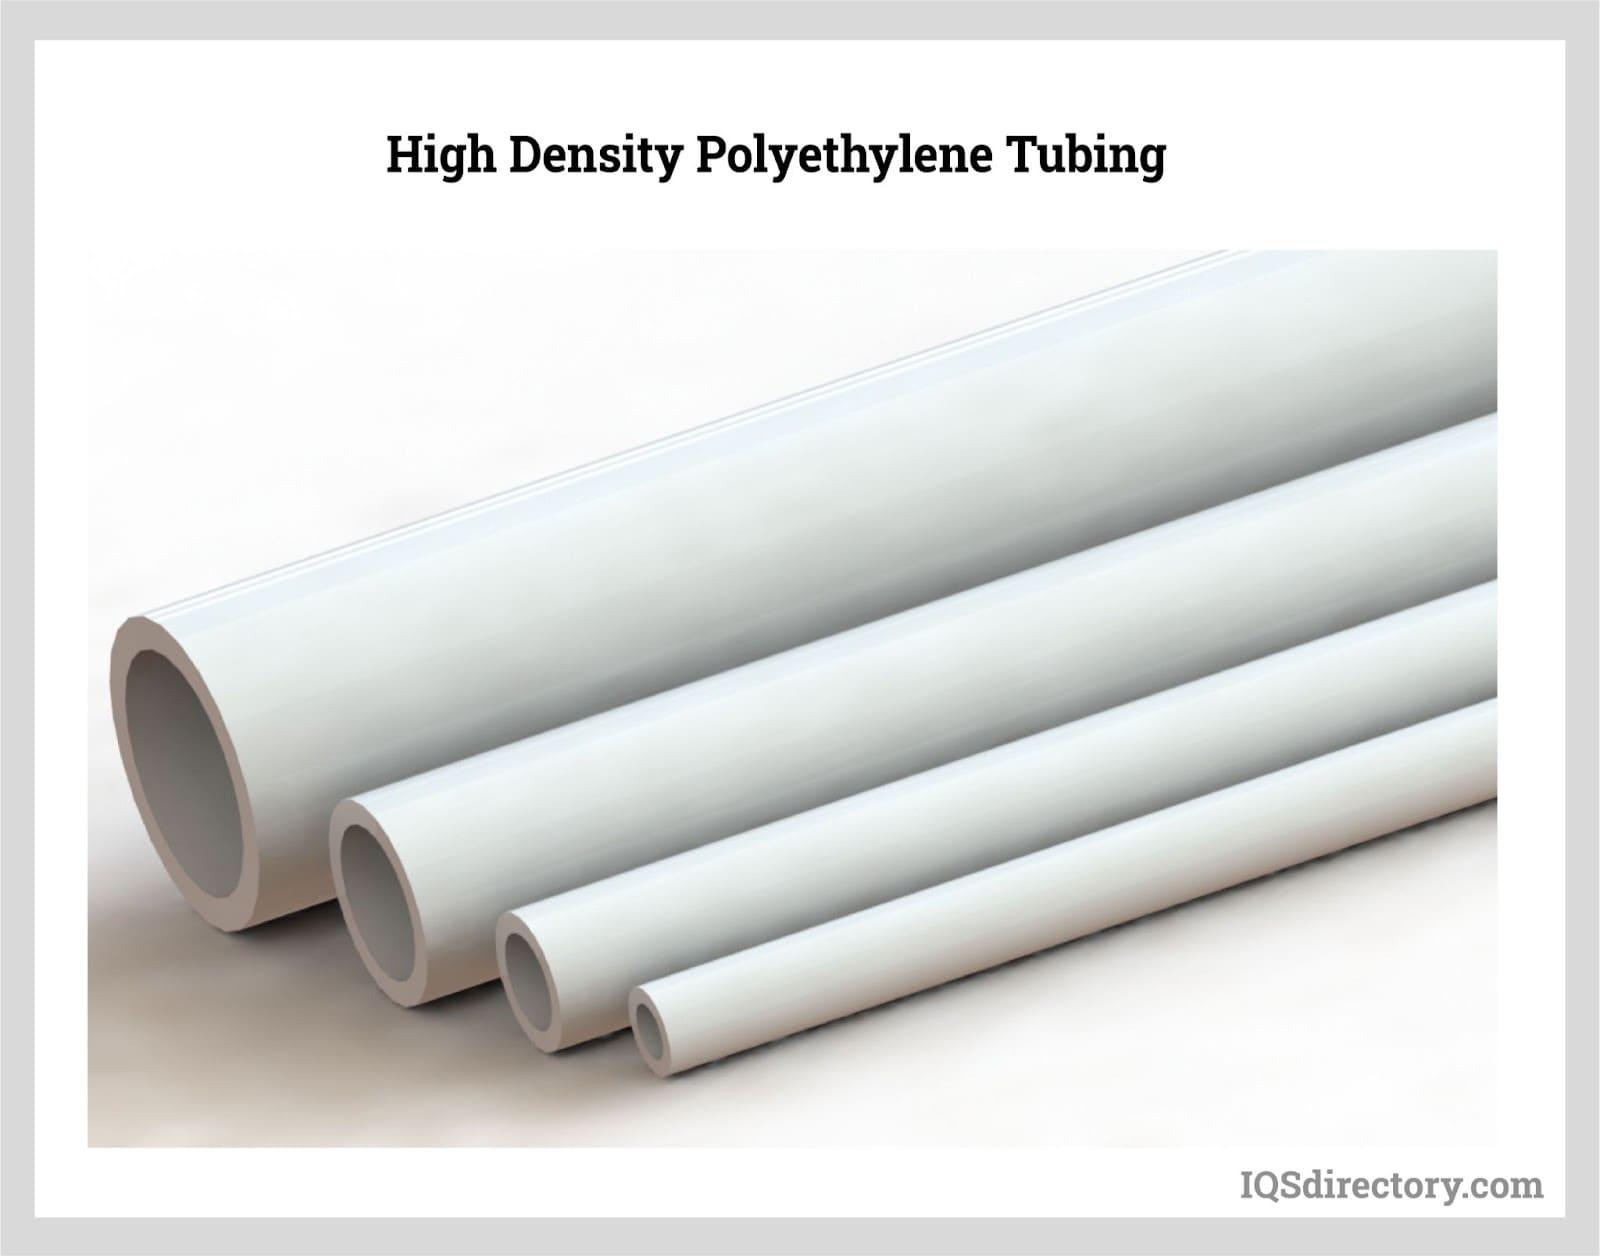 High Density Polyethylene Tubing